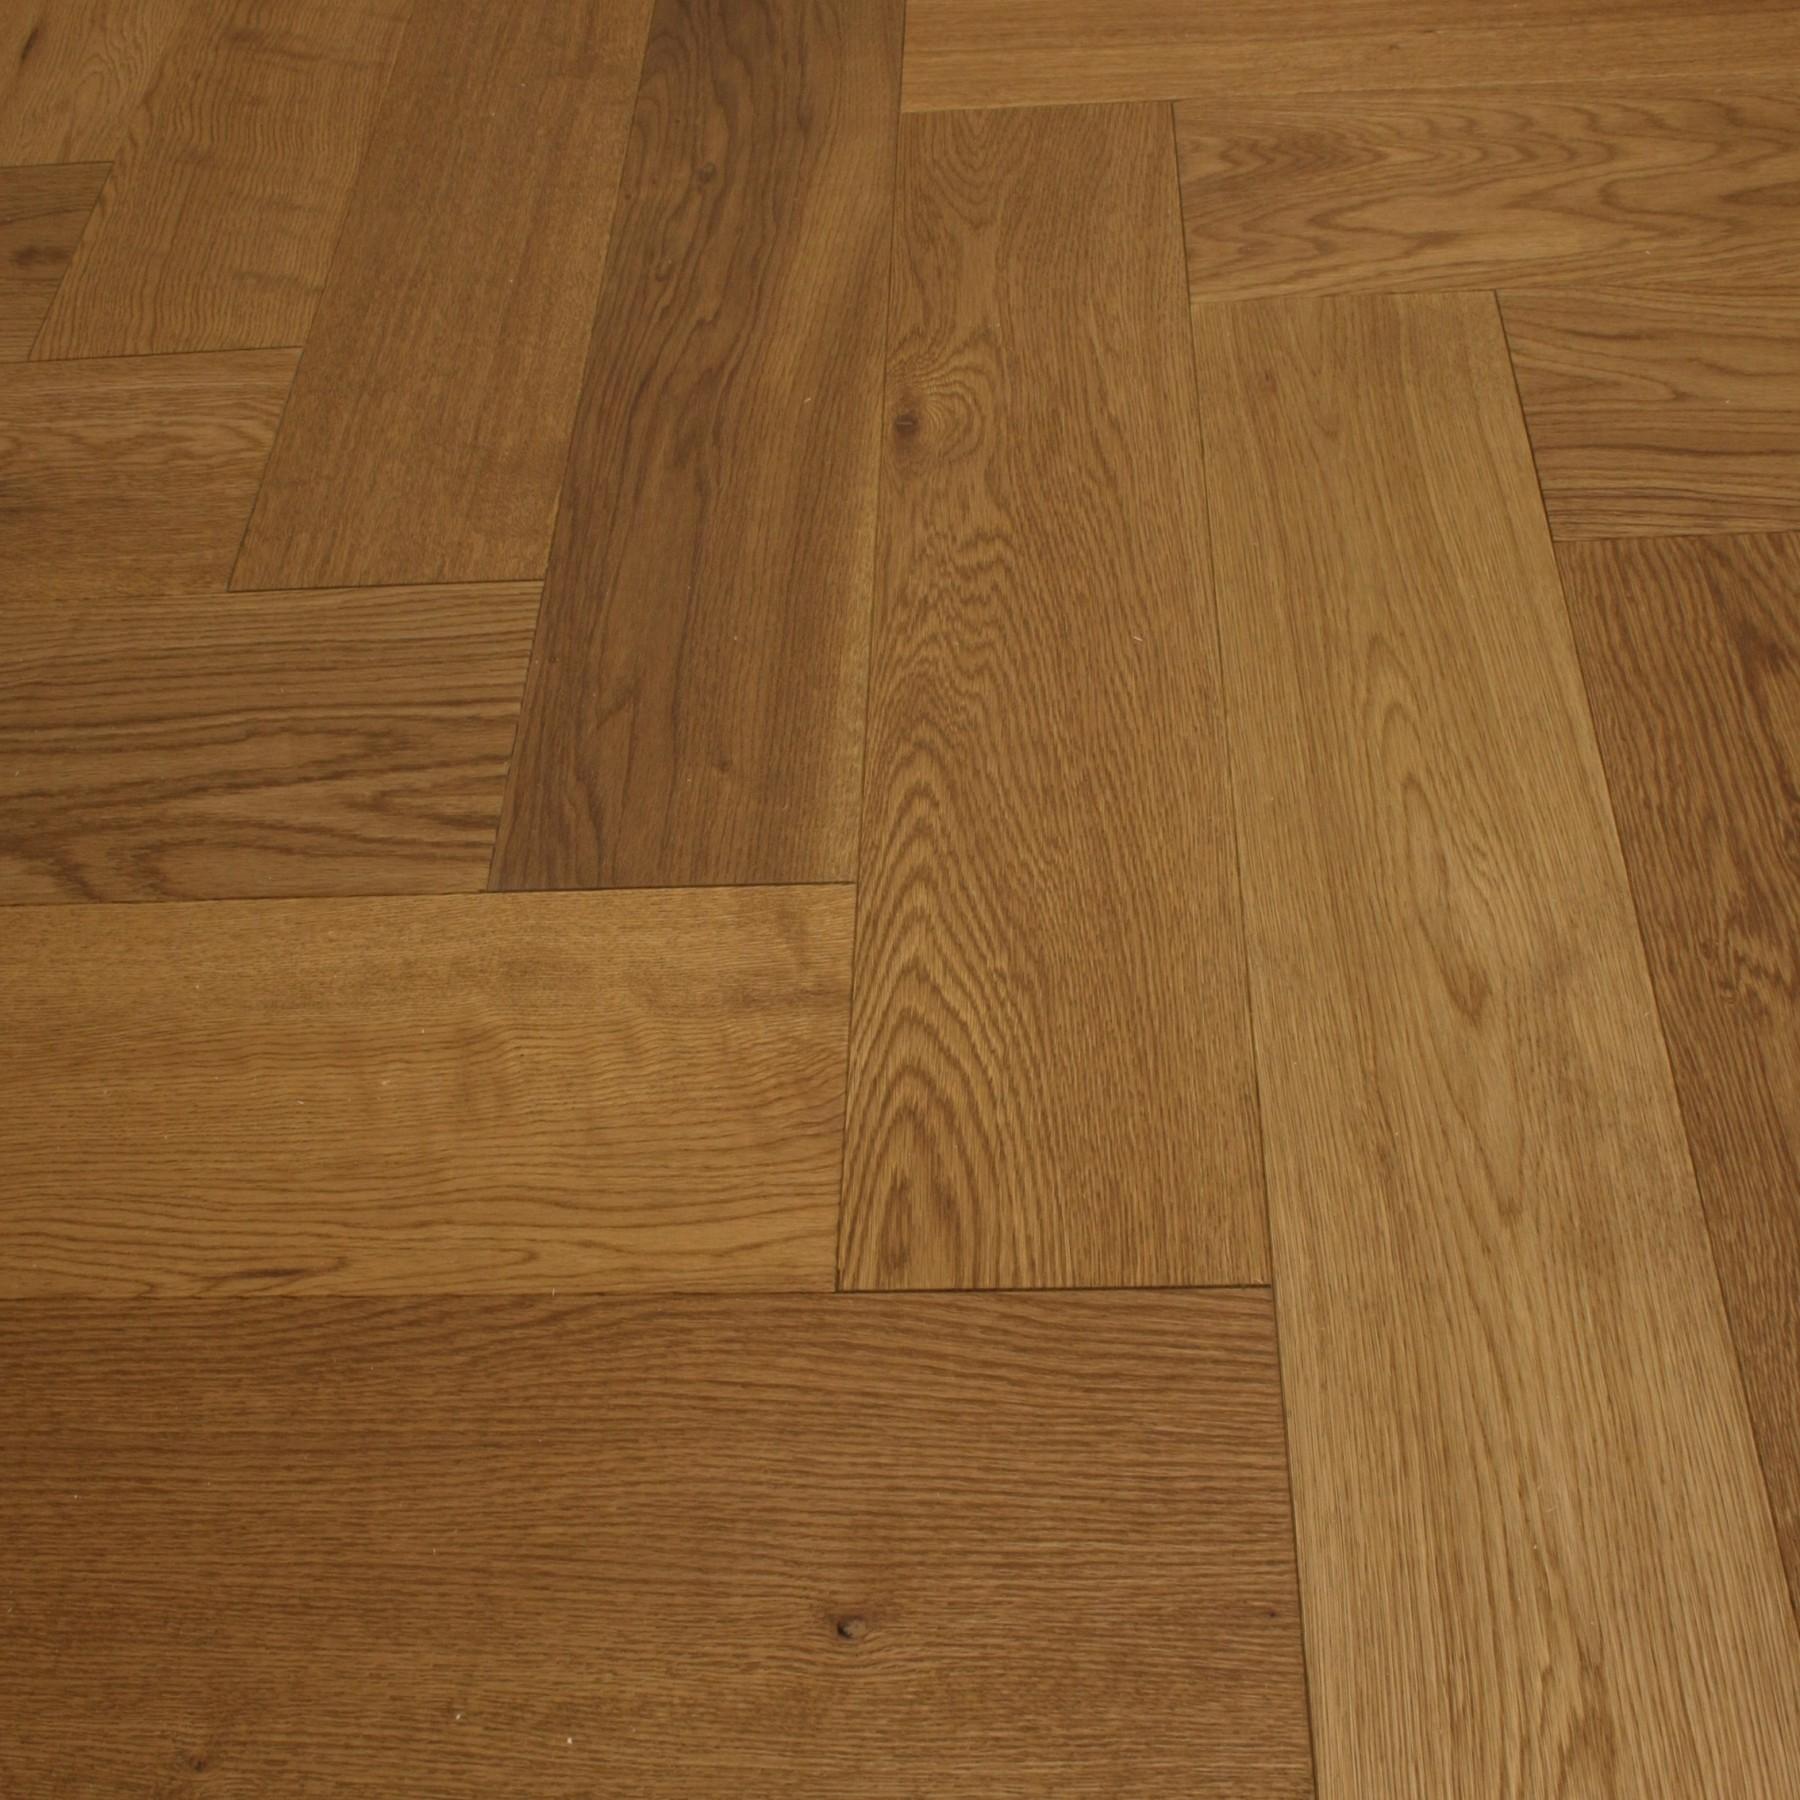 Y2 herringbone engineered wood oak natural uv lacquered for Instock flooring